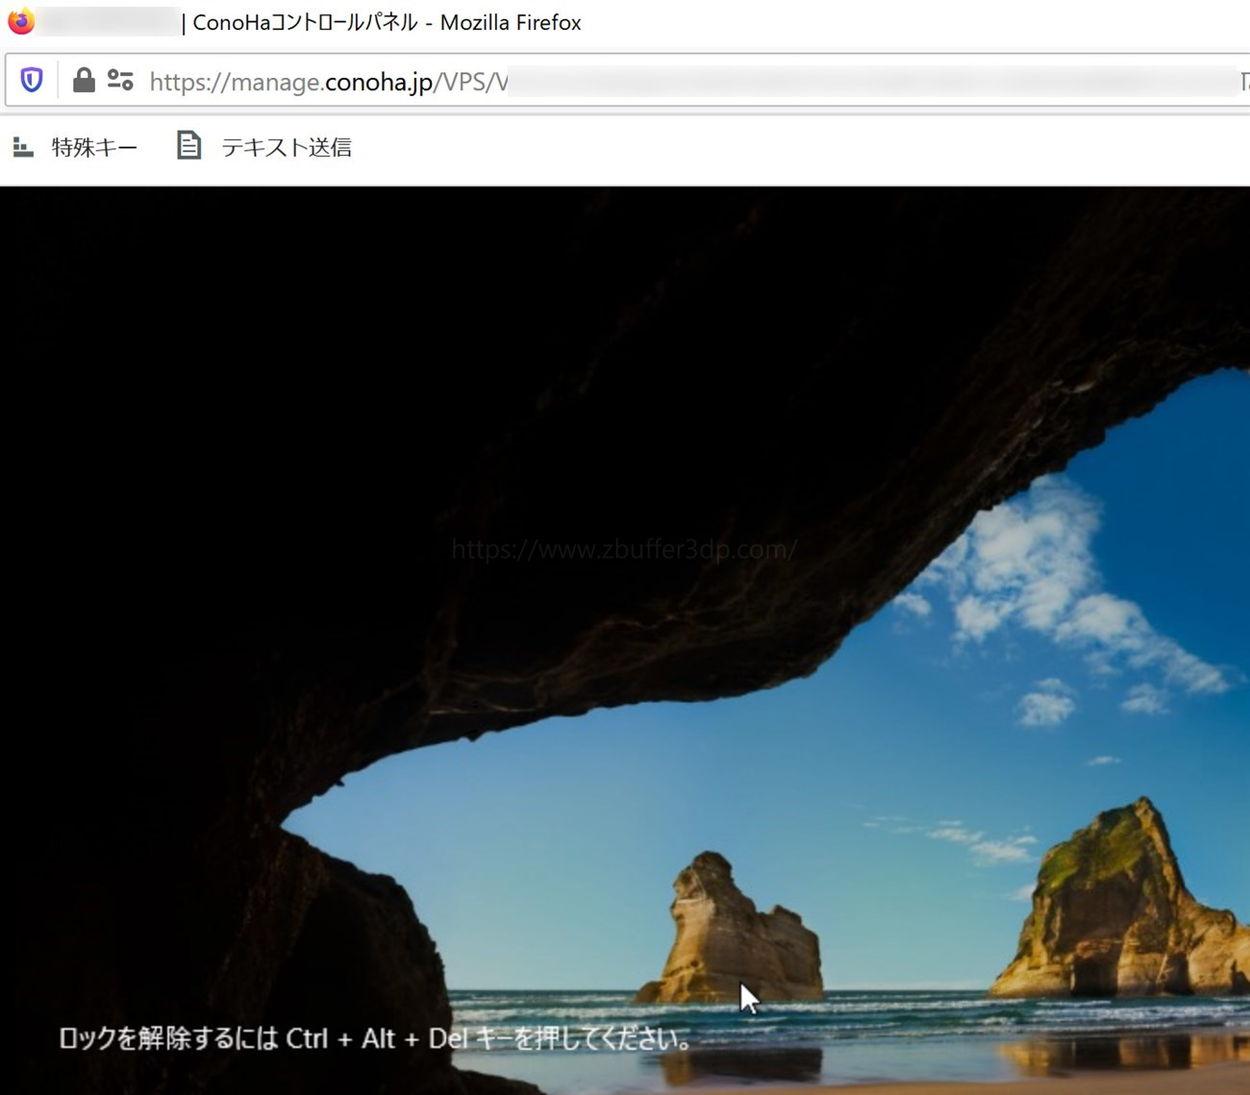 「ConoHa for Windows Server」のコンソール接続した様子